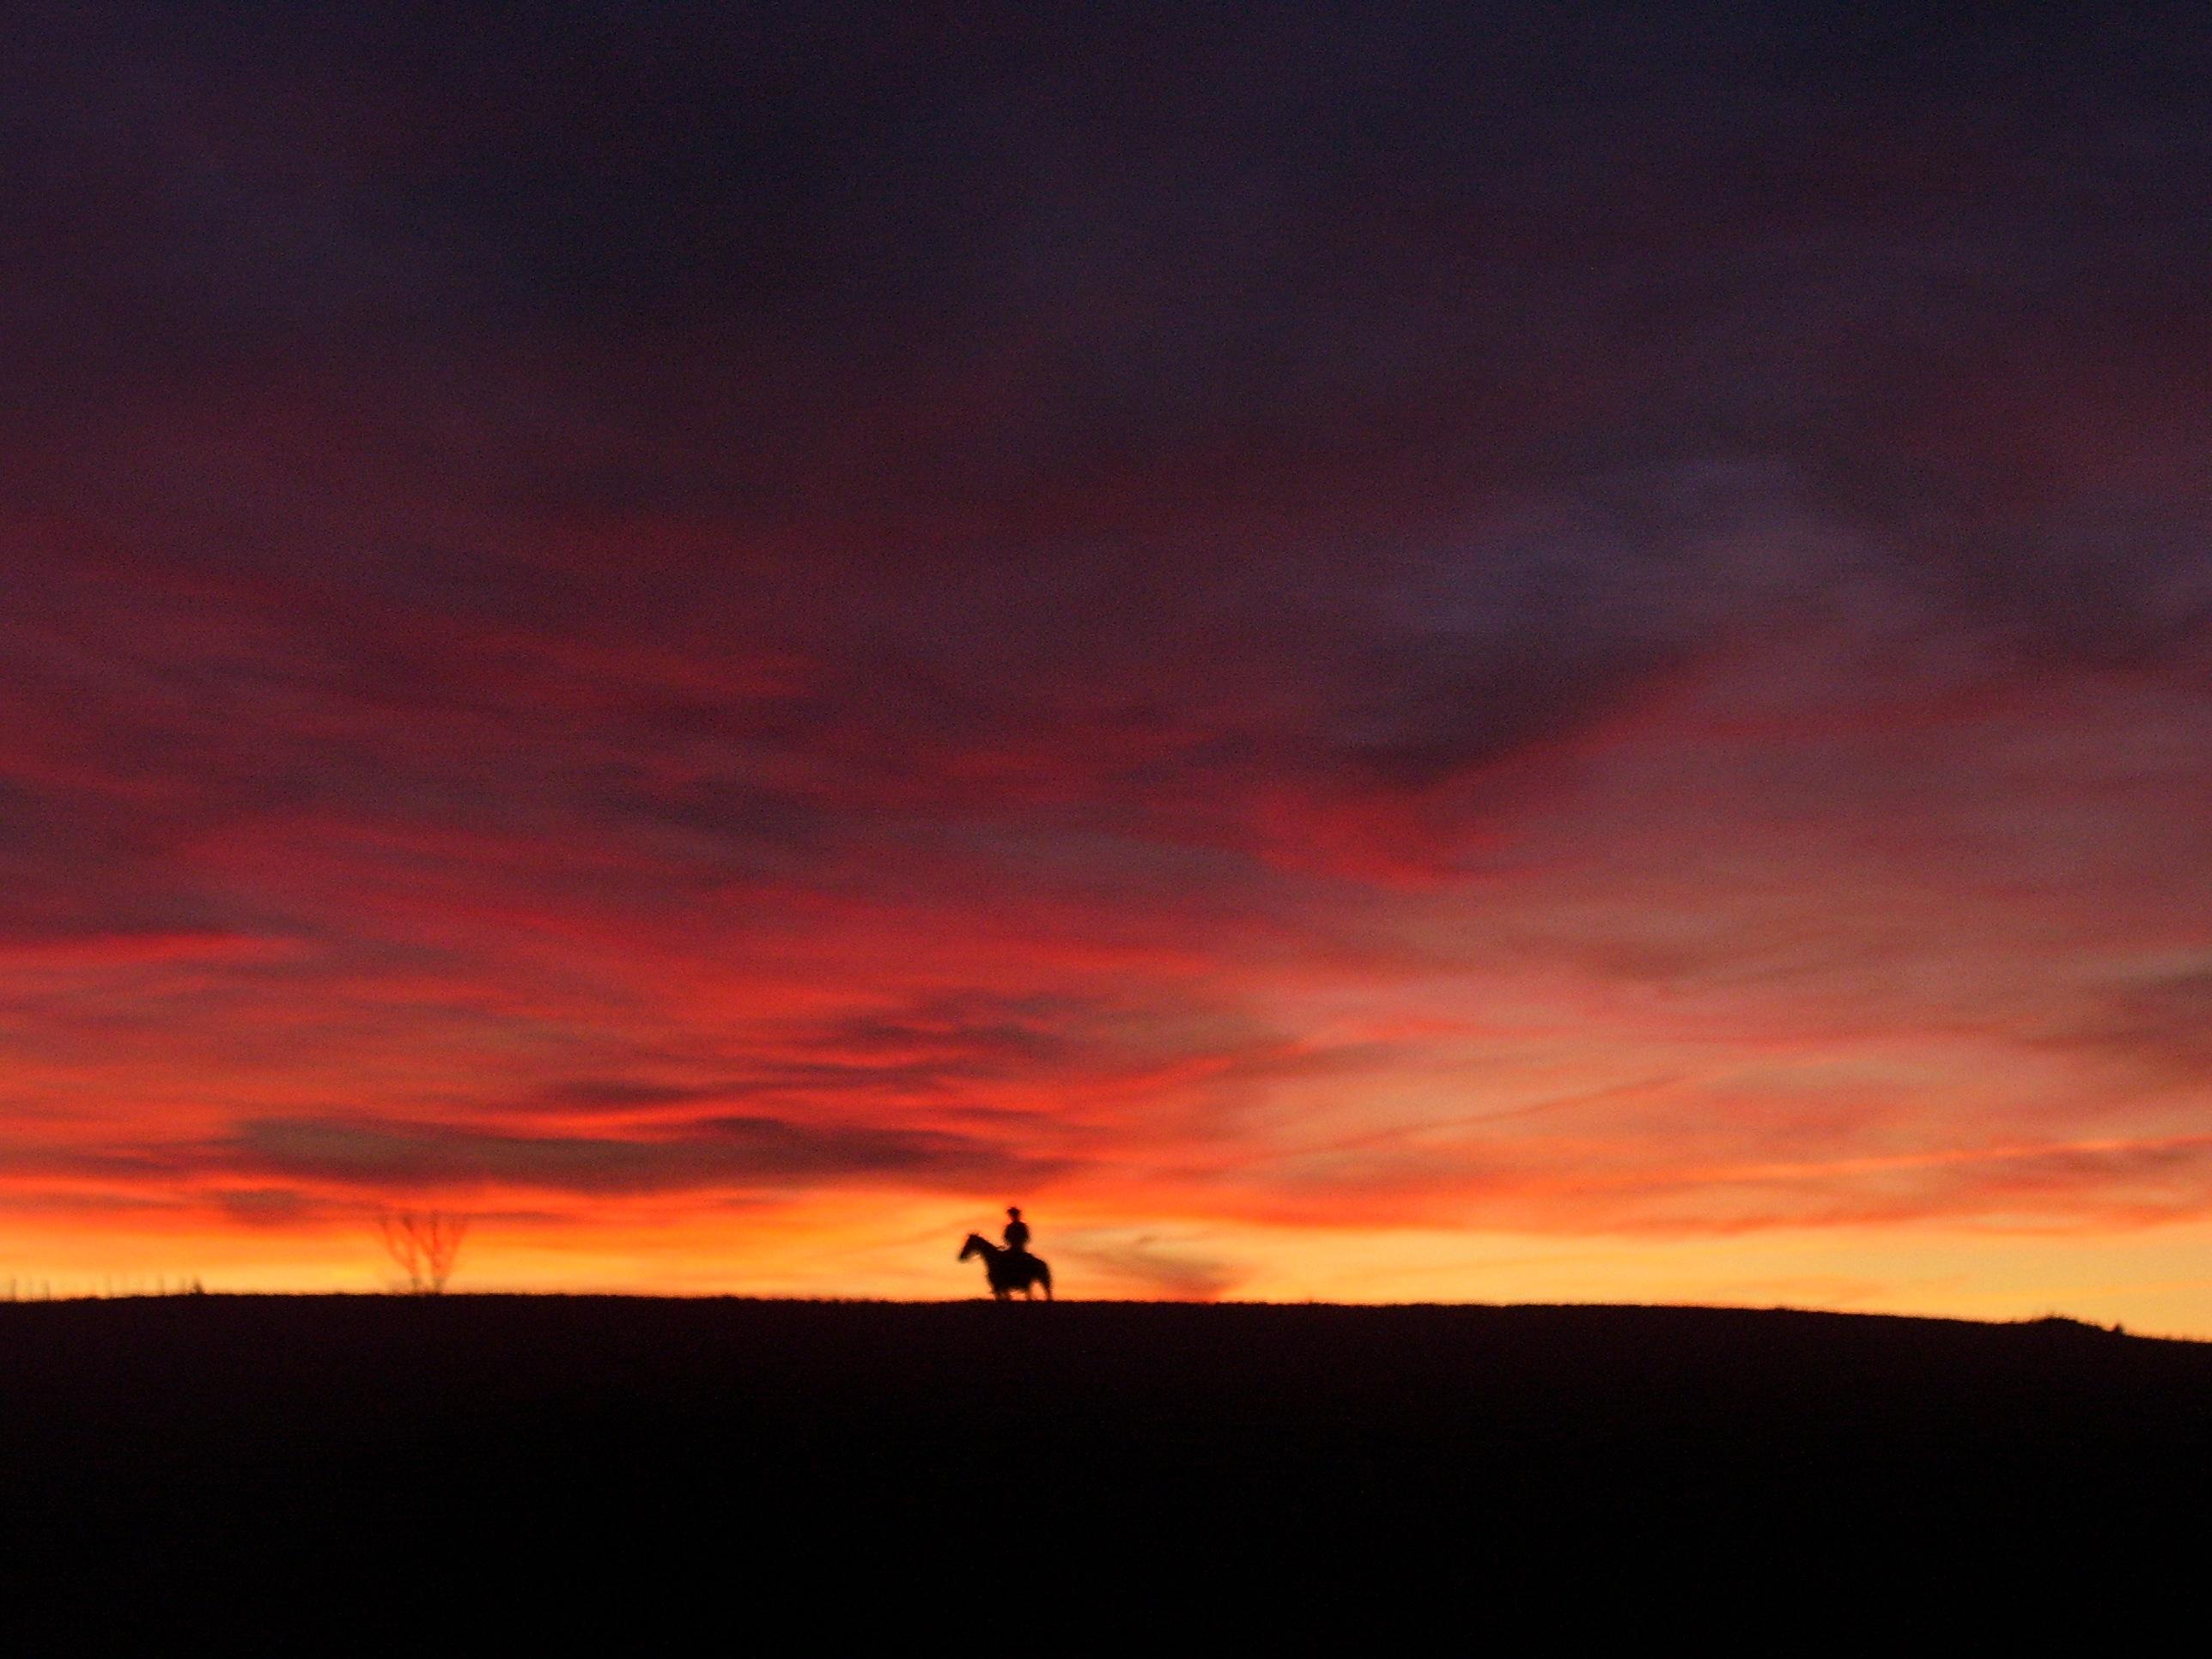 cowboy-silhouette-jpg